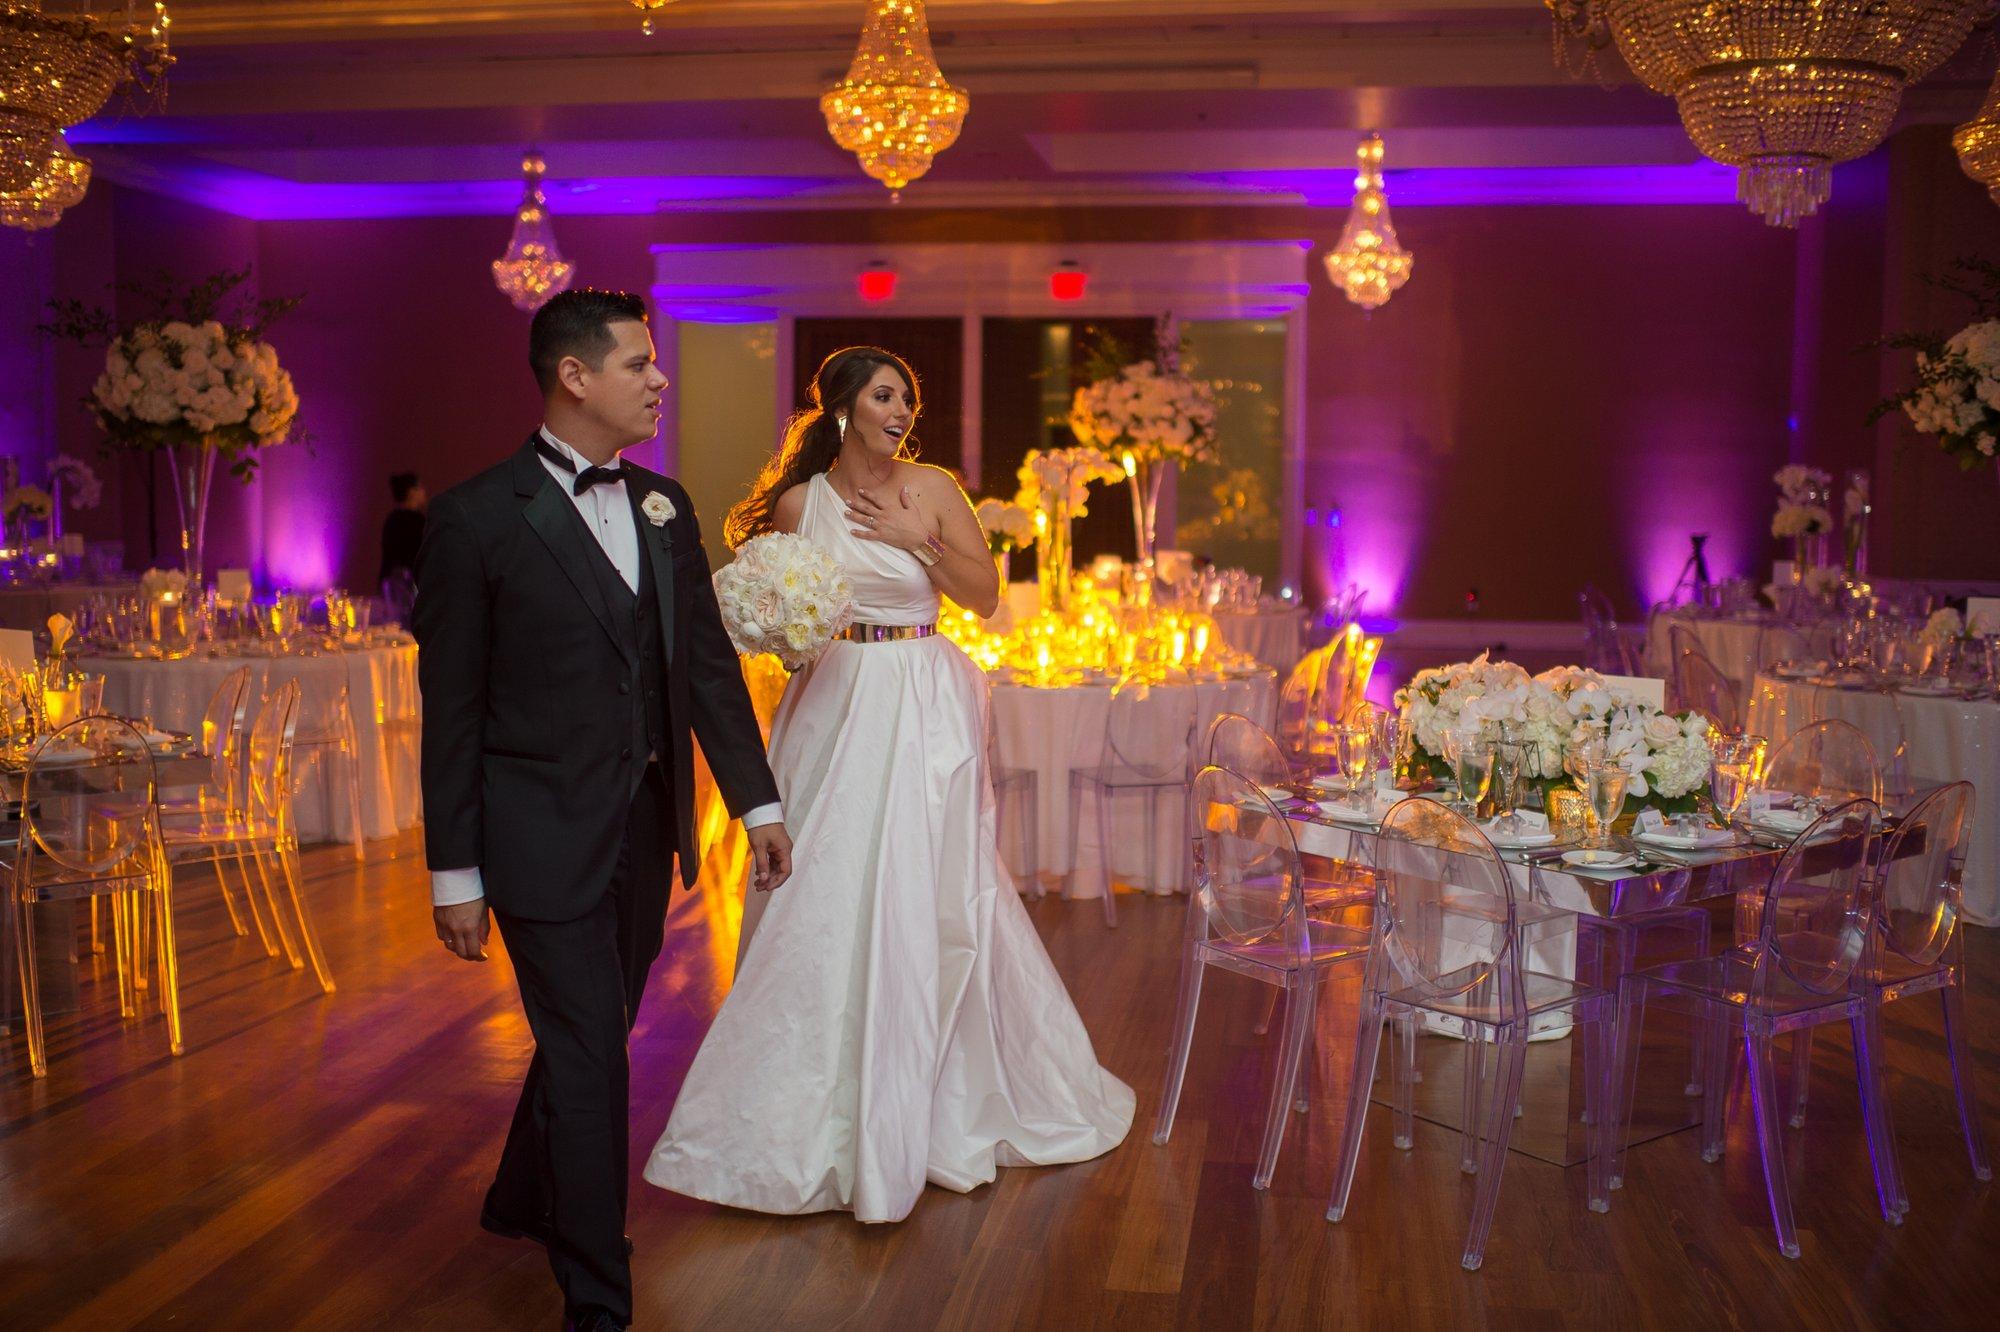 Sconnie wedding